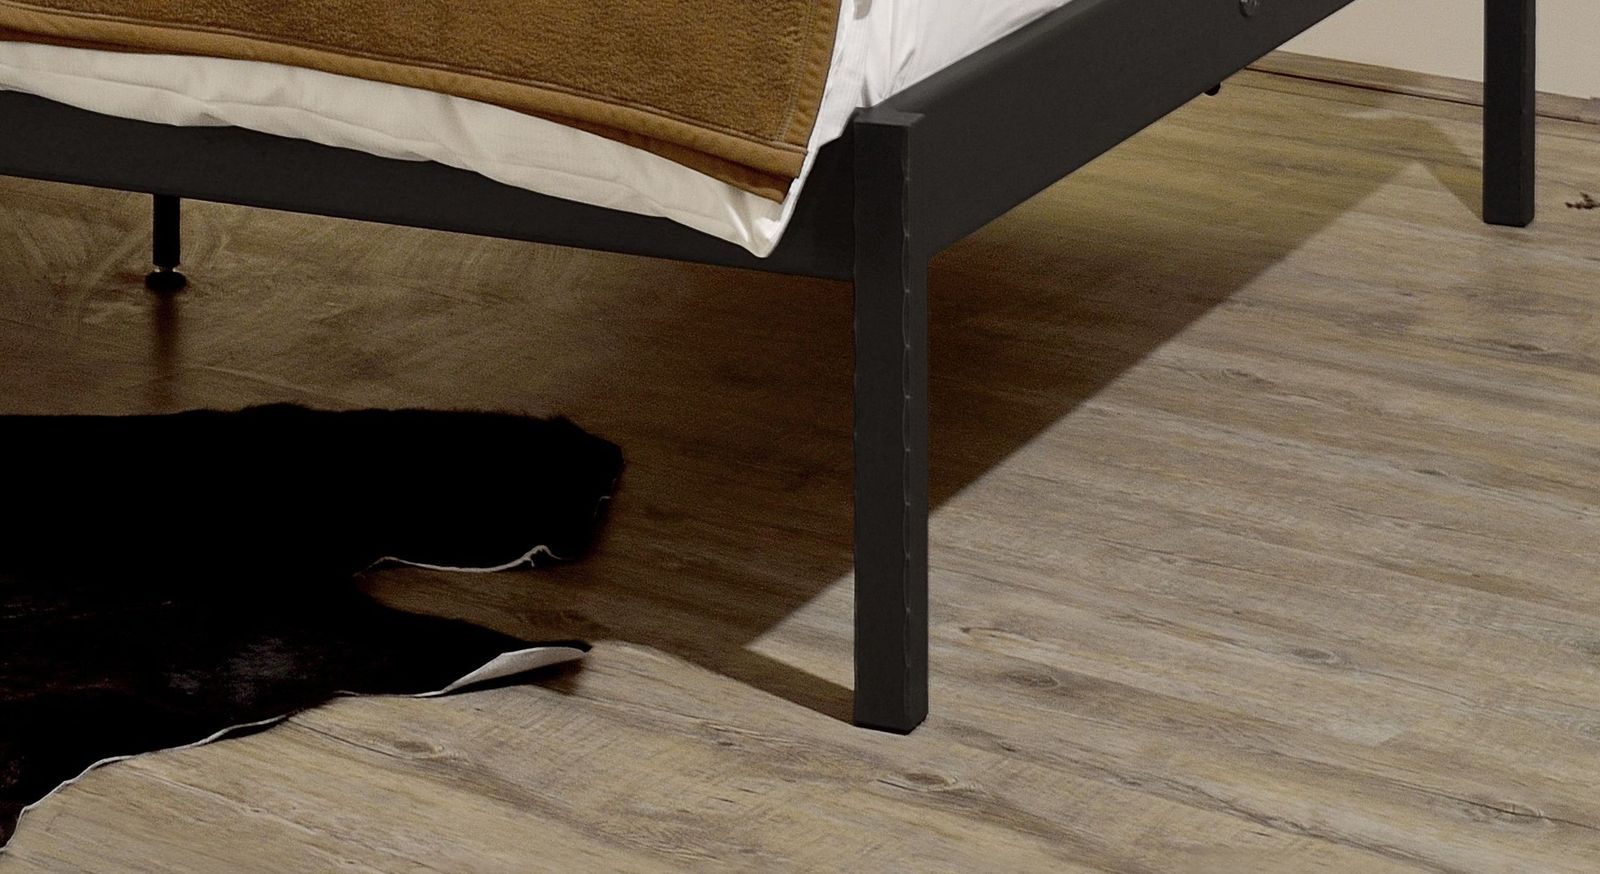 Bett Pintanas Füße aus massivem Eisen